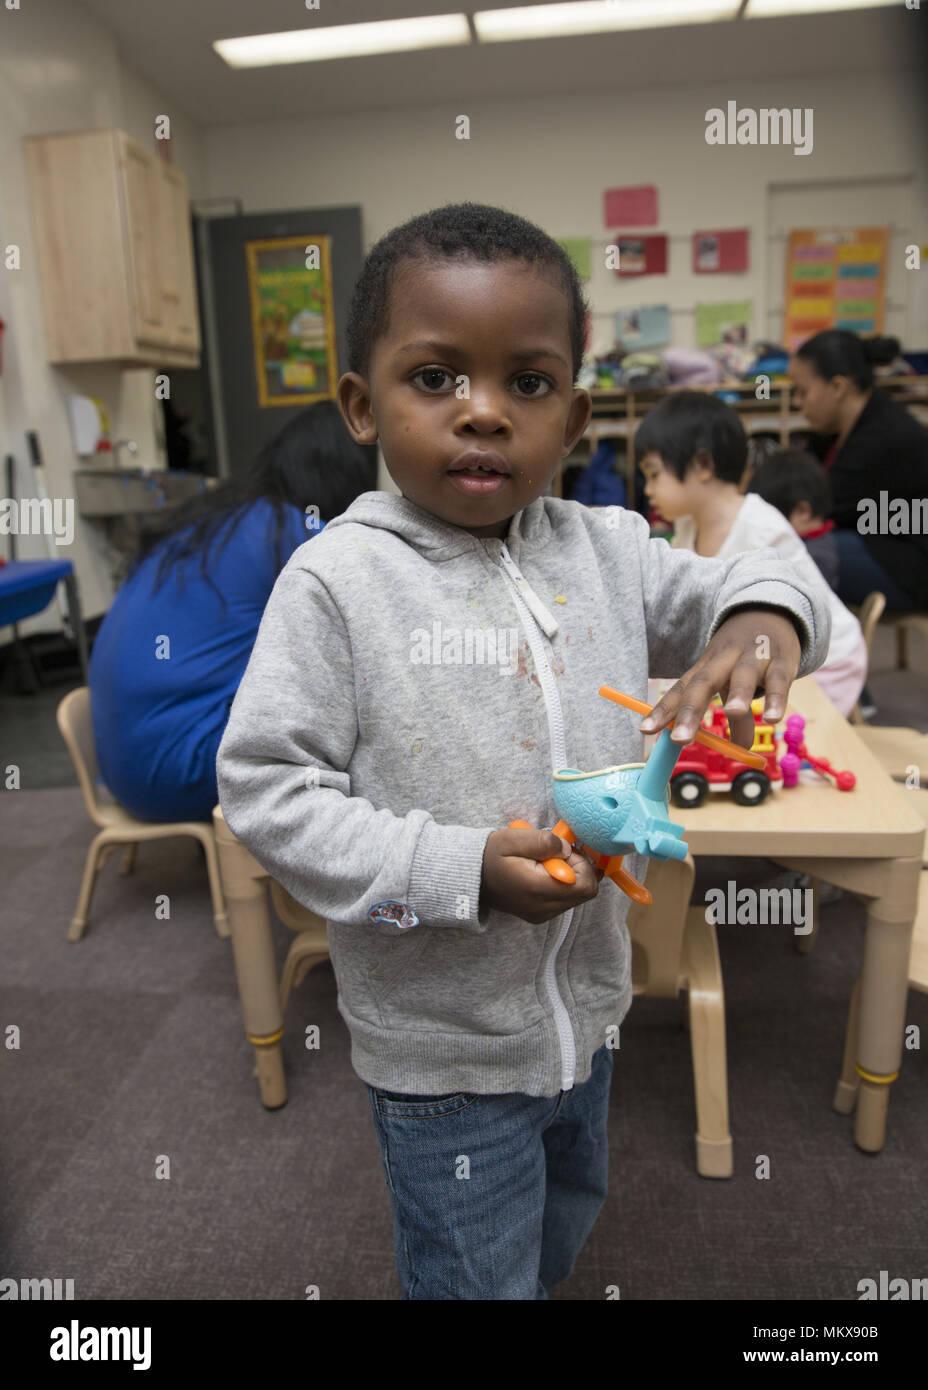 Lower East Side multi ethnic nursery school in the Chinatown neighborhood of Manhattan. Stock Photo